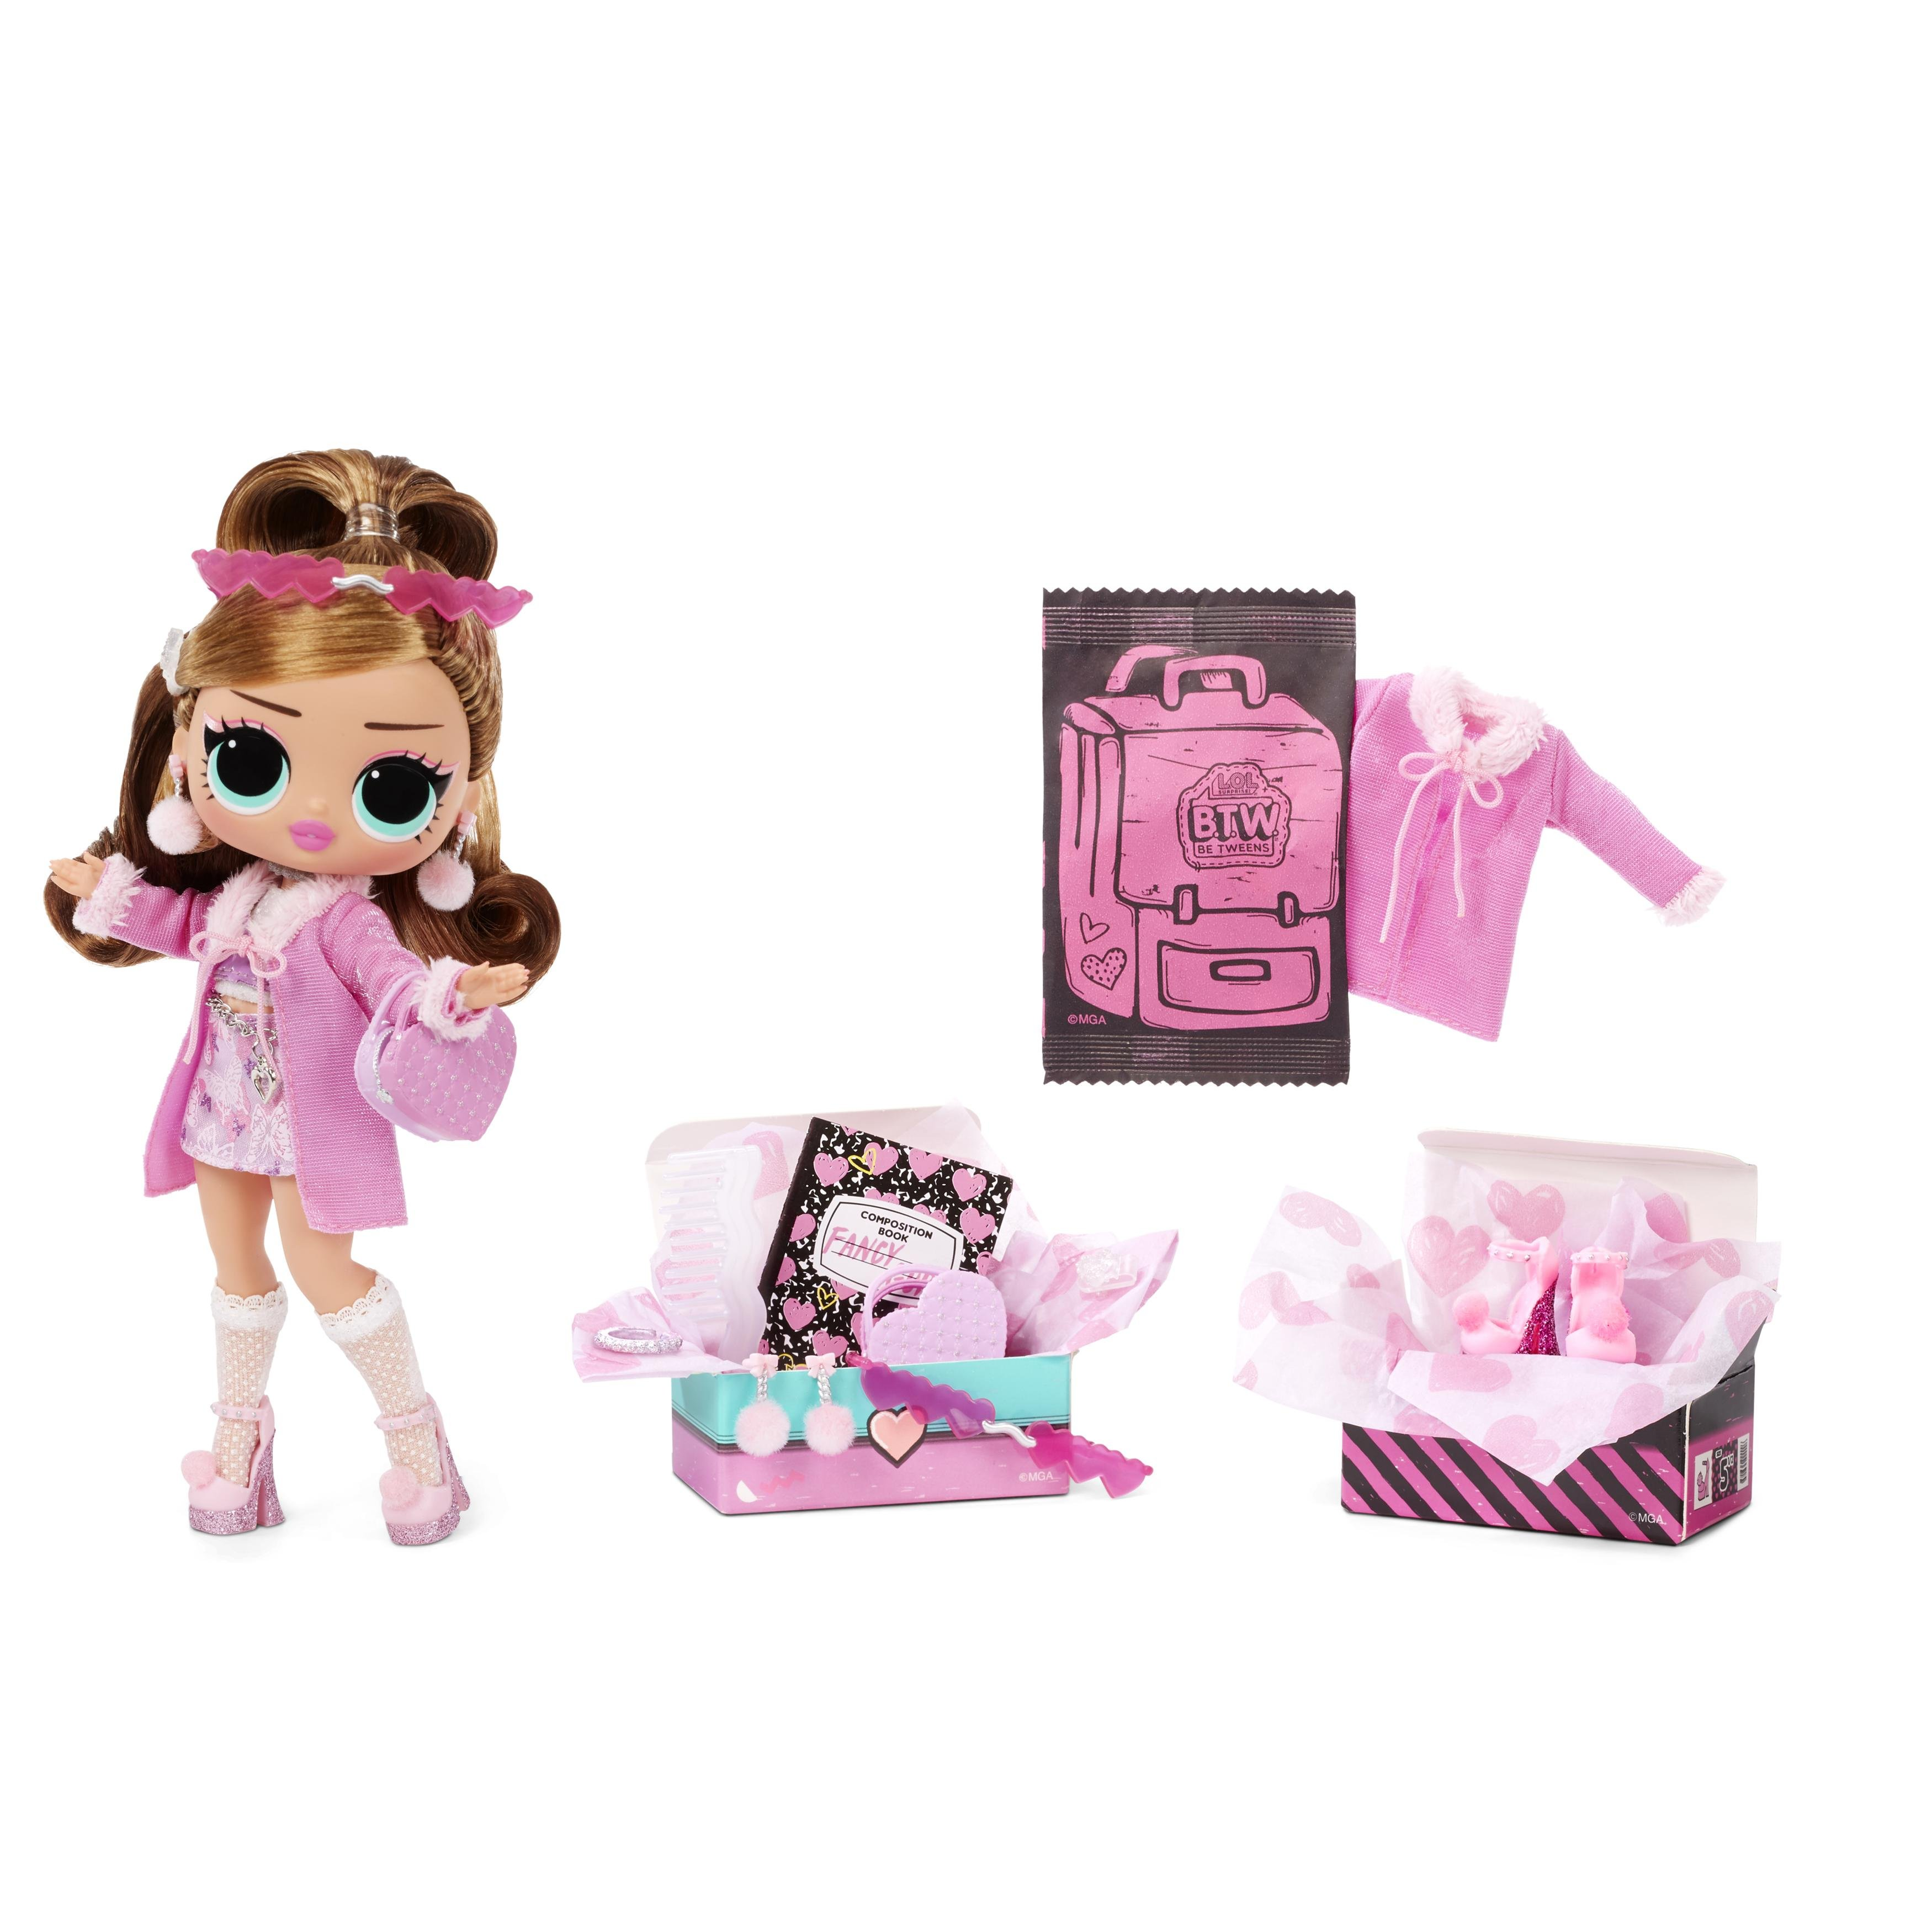 L.O.L. Surprise - BTW Doll- Cherry B.B. (576679)